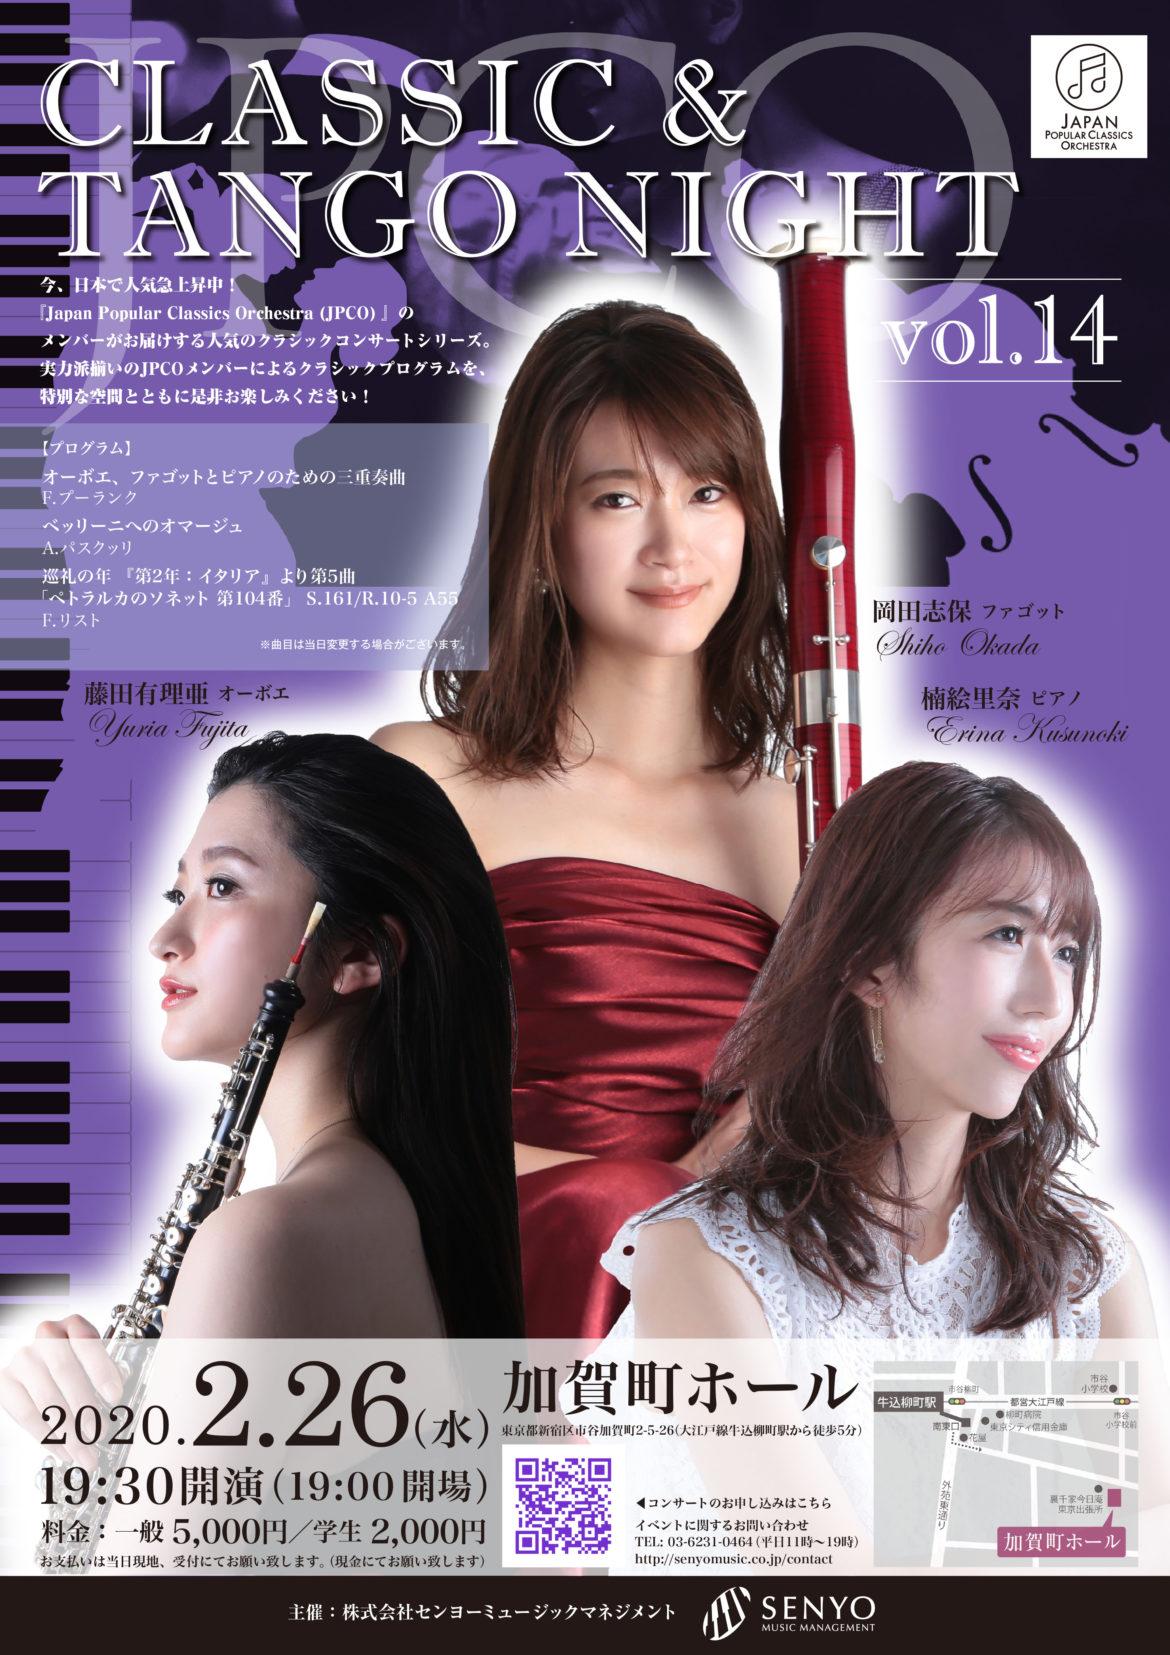 2020.2.26  JPCO CLASSIC & TANGO NIGHT vol.14